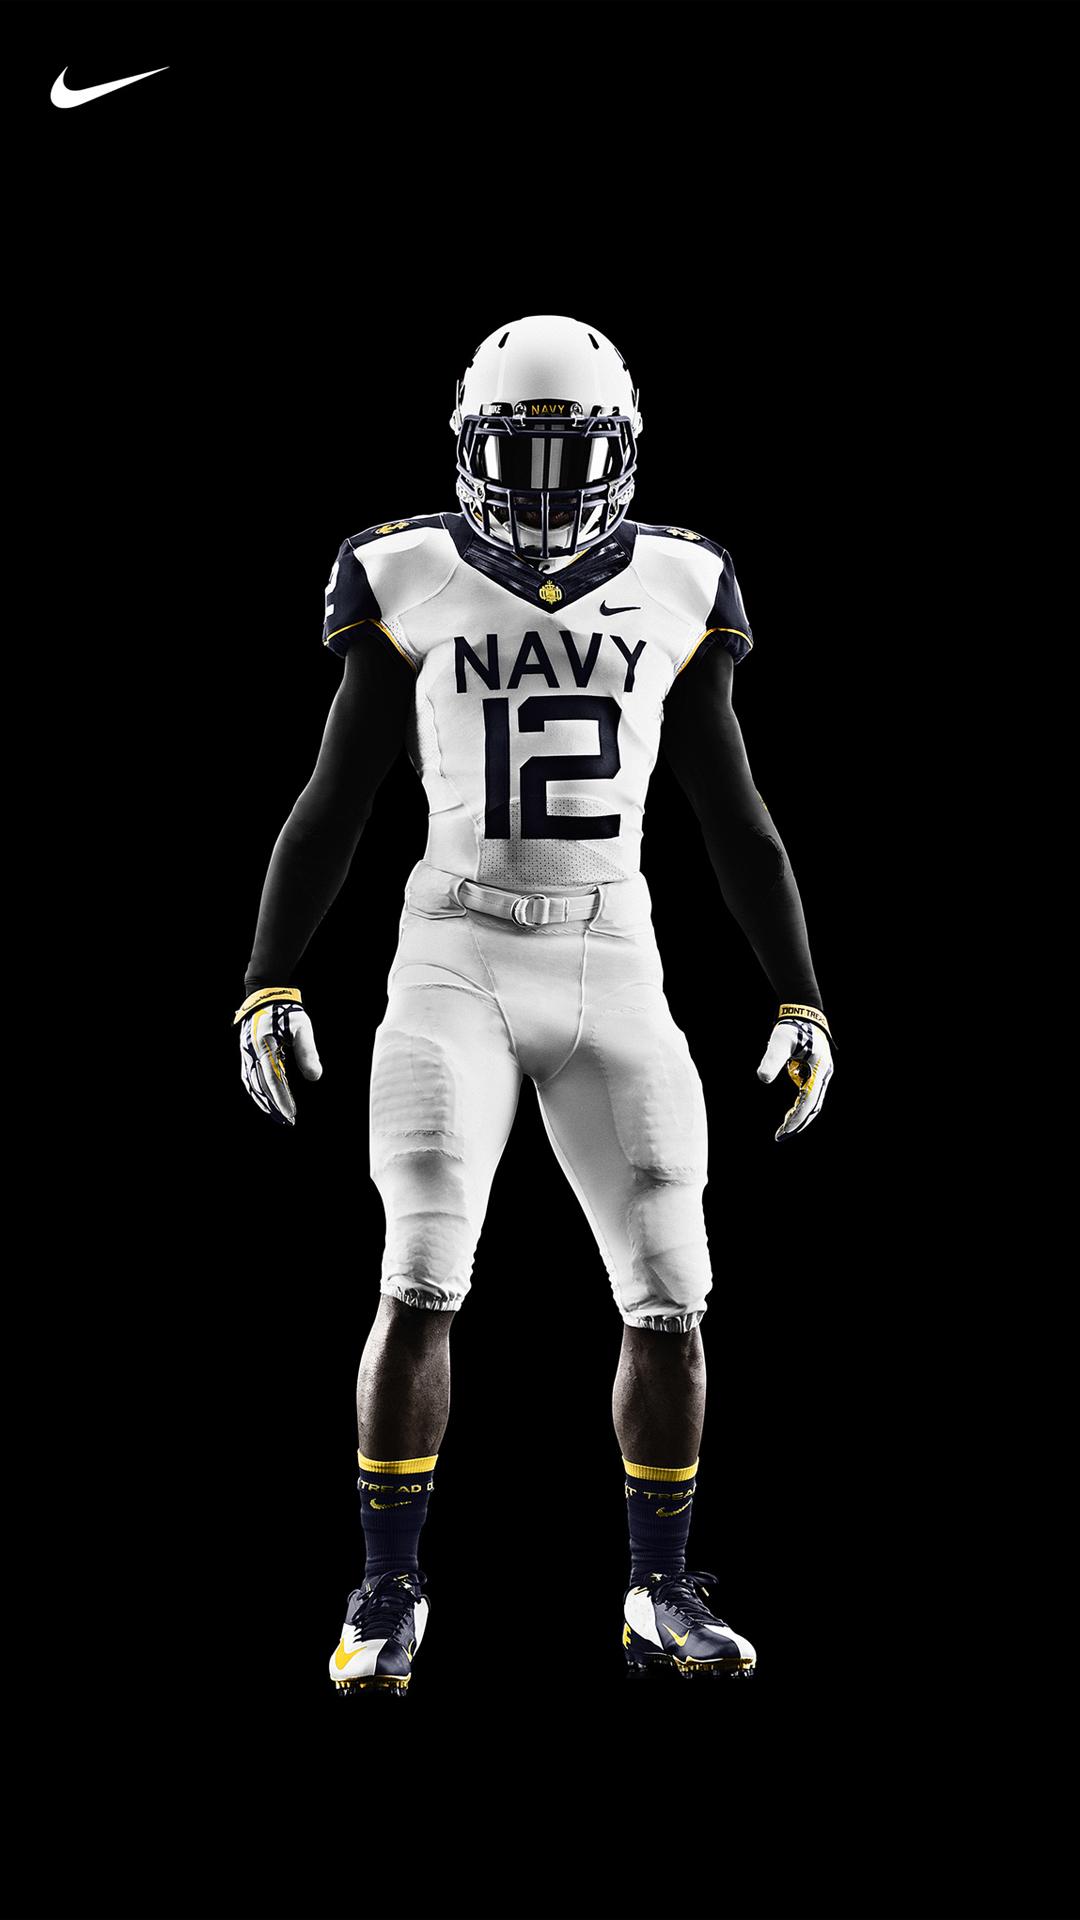 Nike American Football Wallpaper Usc Nike football navy uniform 1080x1920